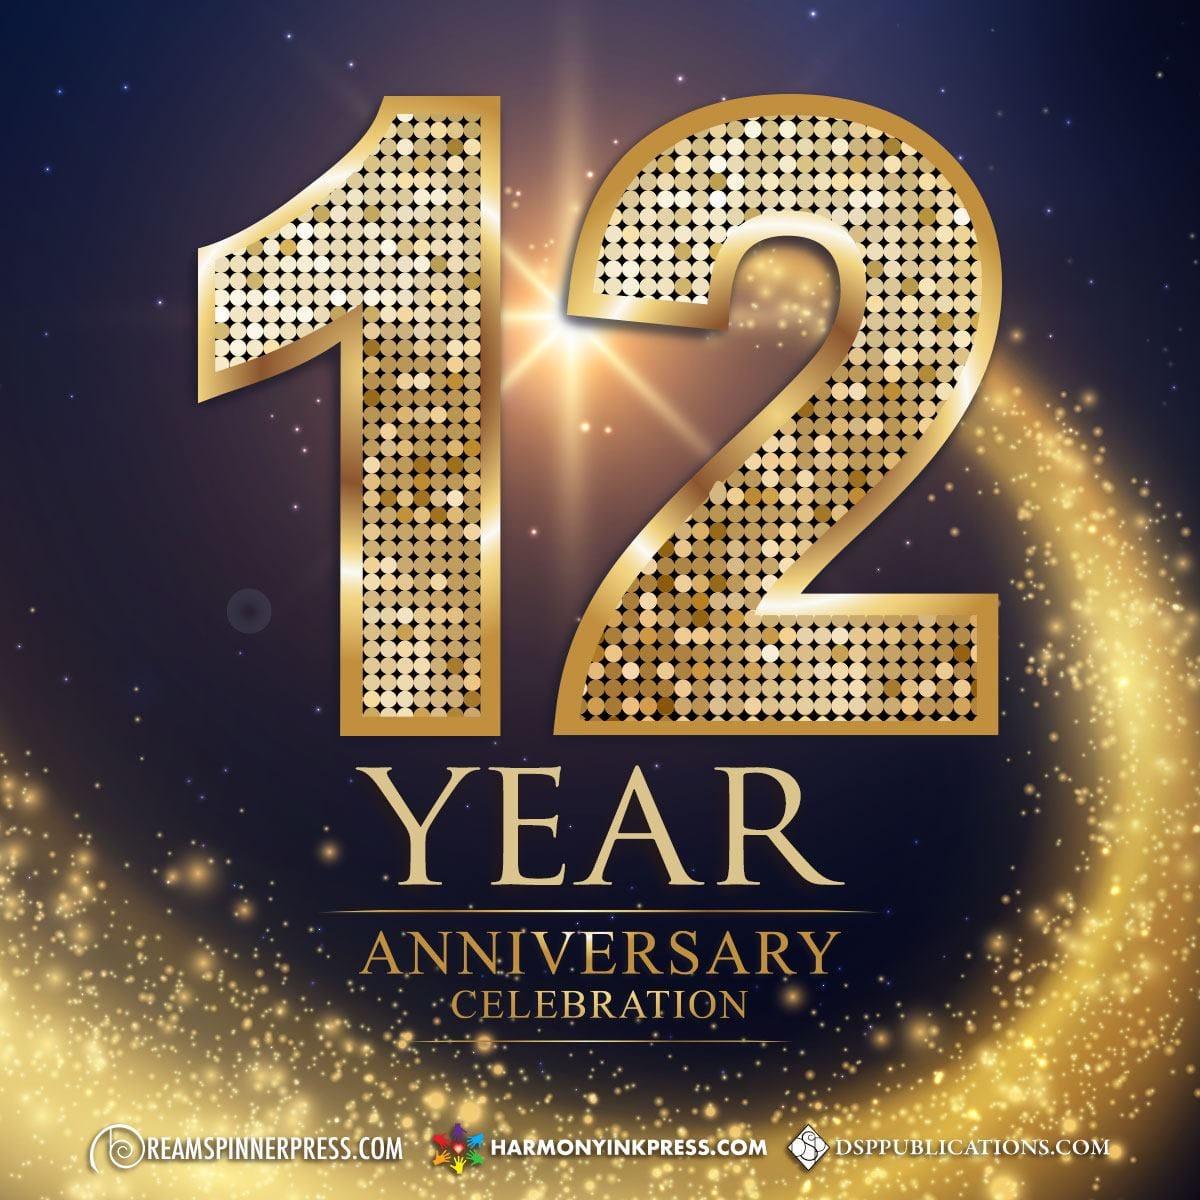 Dreamspinner Press 12th Anniversary Celebration